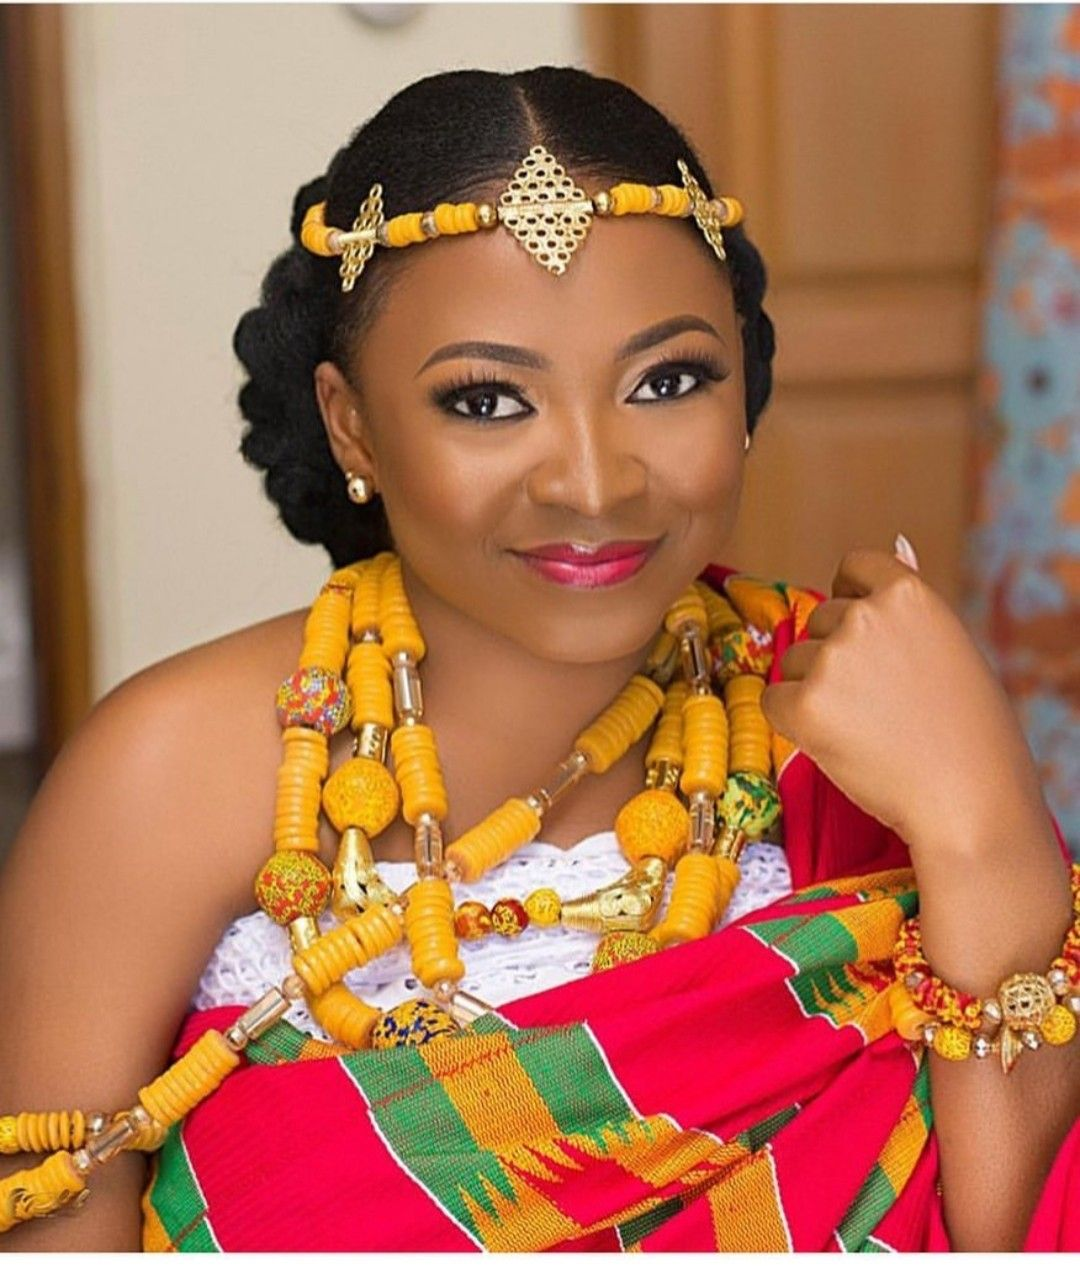 Ghanaian Wedding Hairstyles 2018 Latest Bridal Hairstyles In Ghana Today Newspaper Natural Hair Styles Hair Styles Bridal Hairstyles With Braids